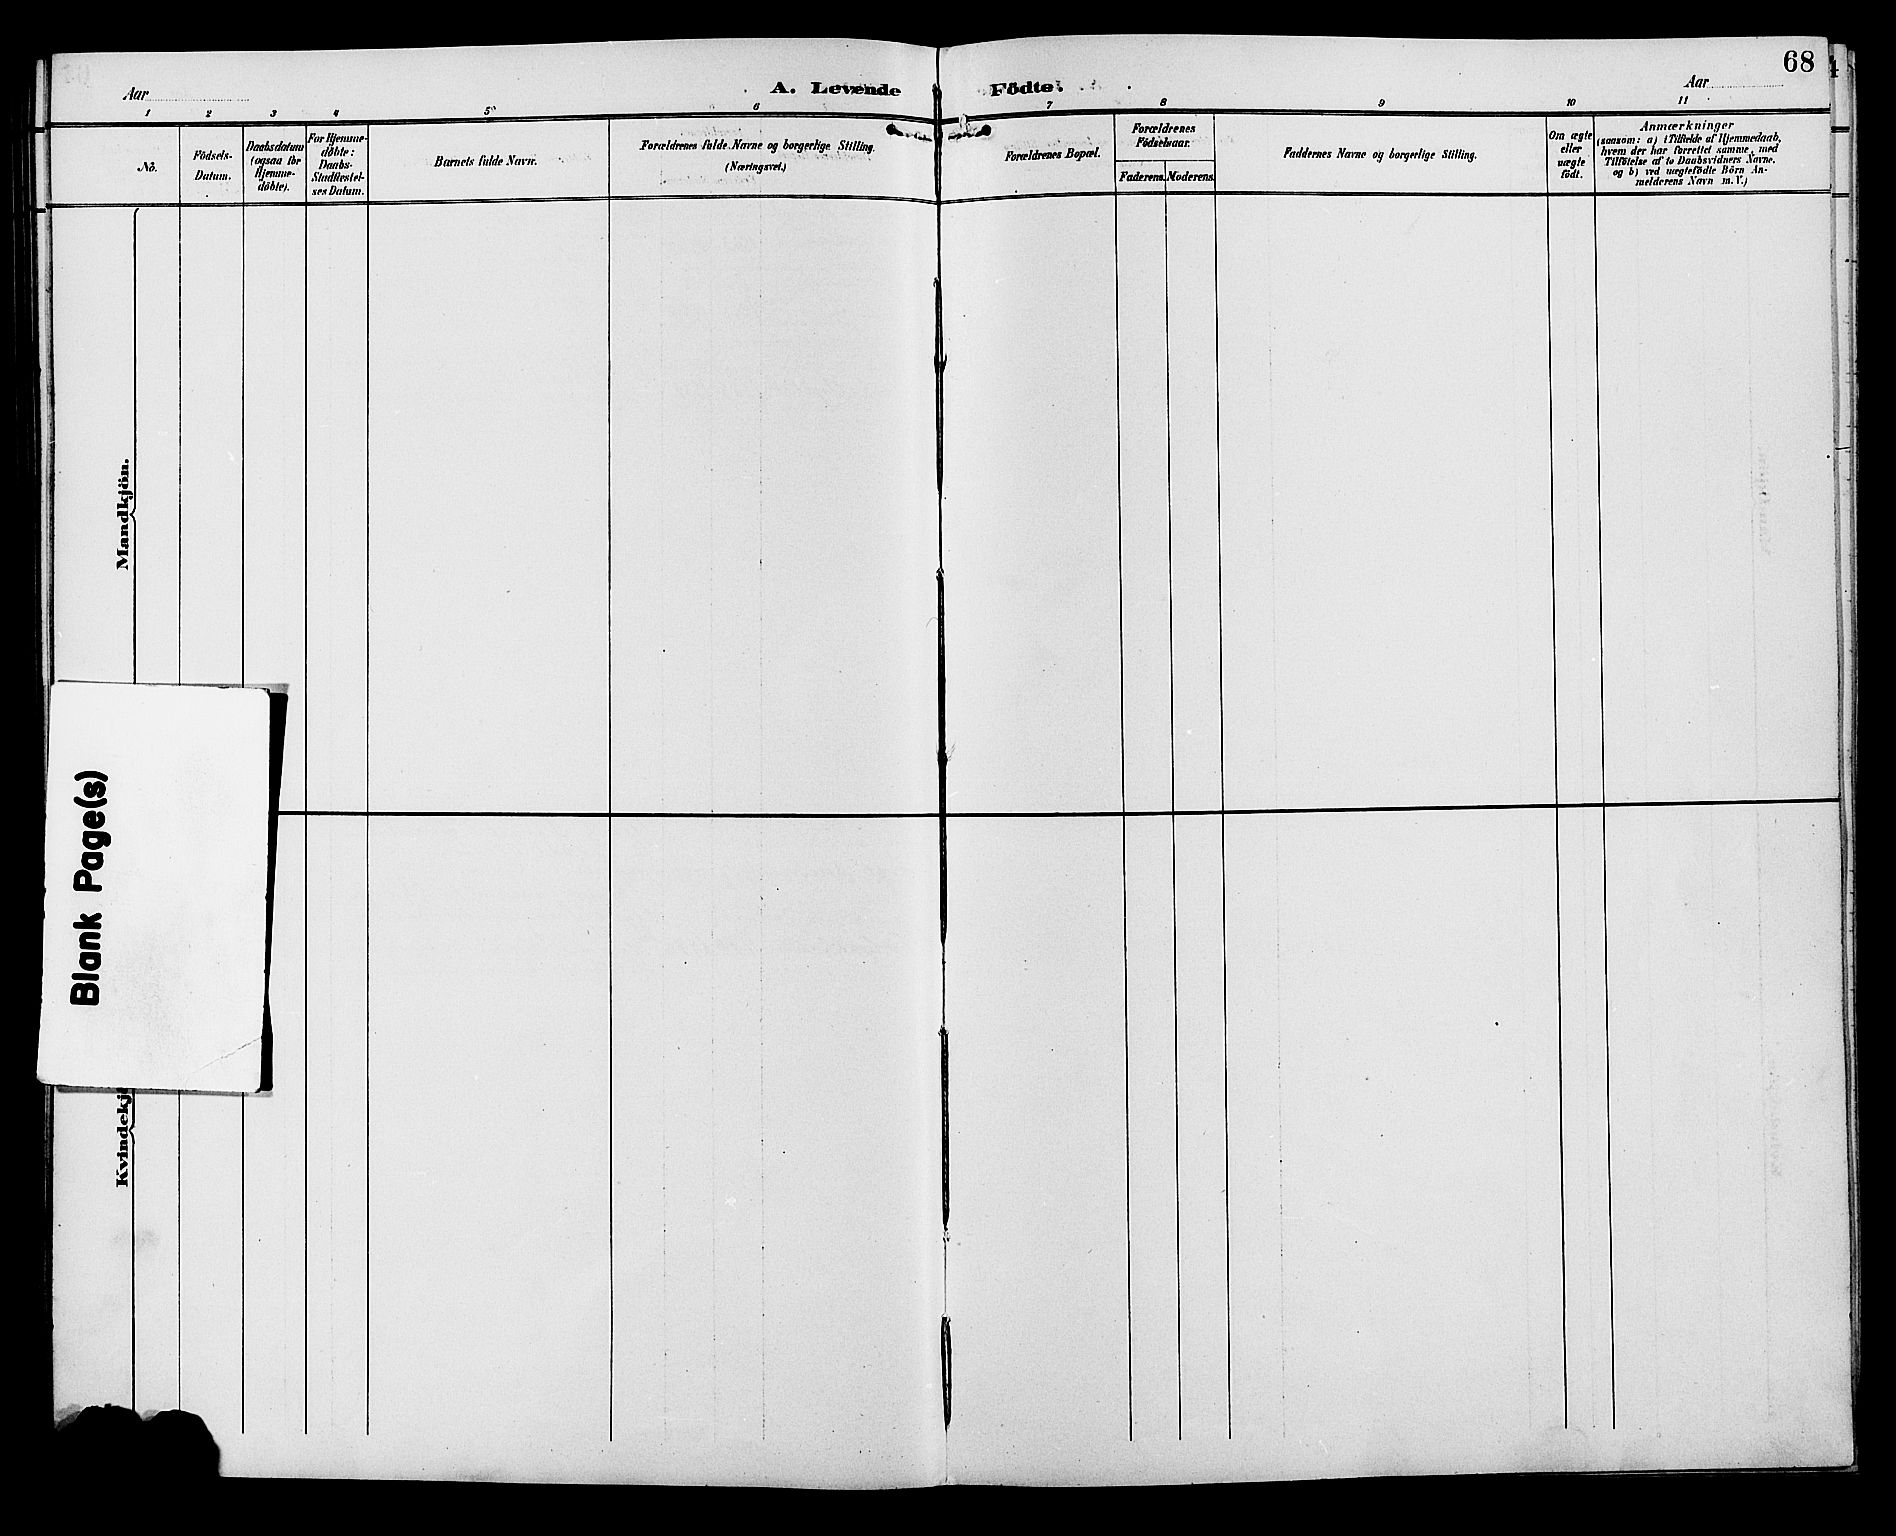 SAH, Ringebu prestekontor, Klokkerbok nr. 7, 1890-1910, s. 68